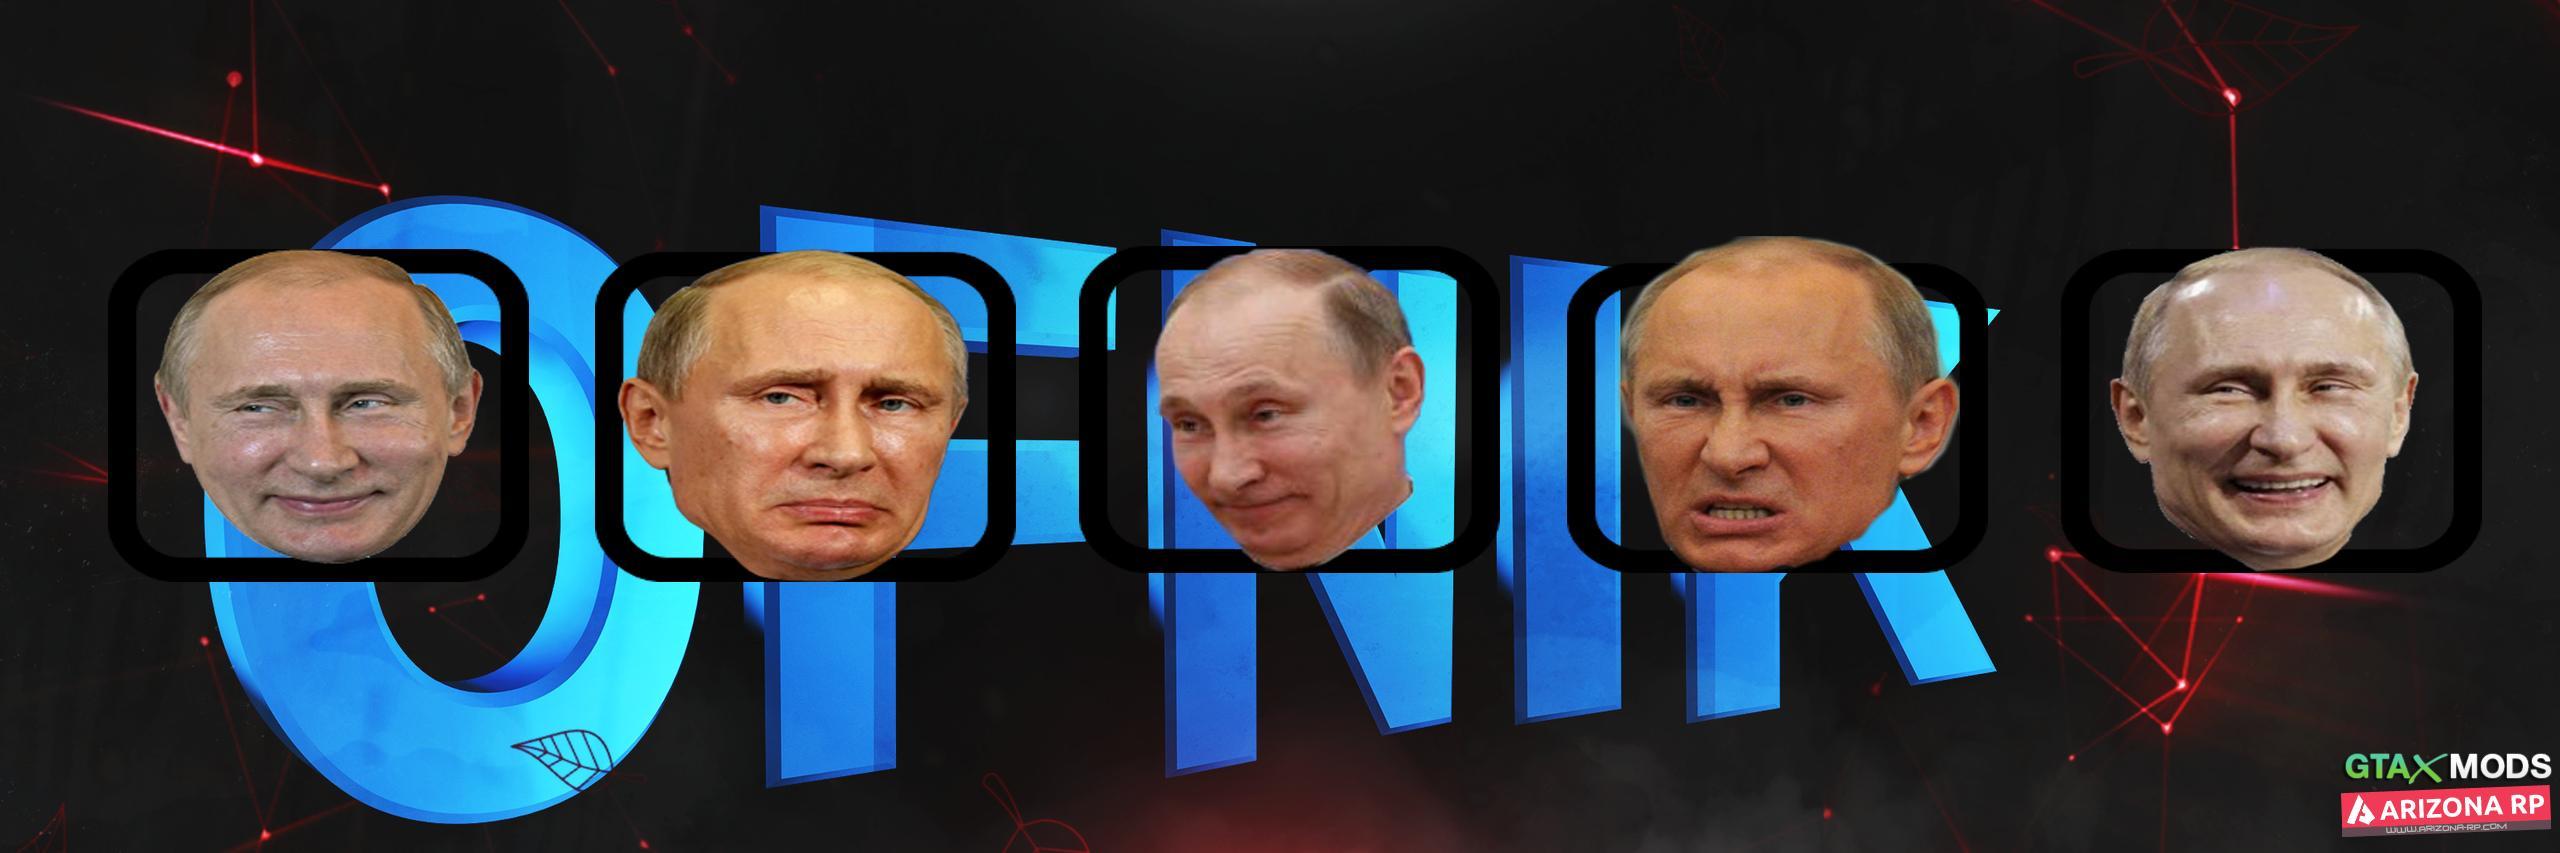 5 фистов с лицом Путина